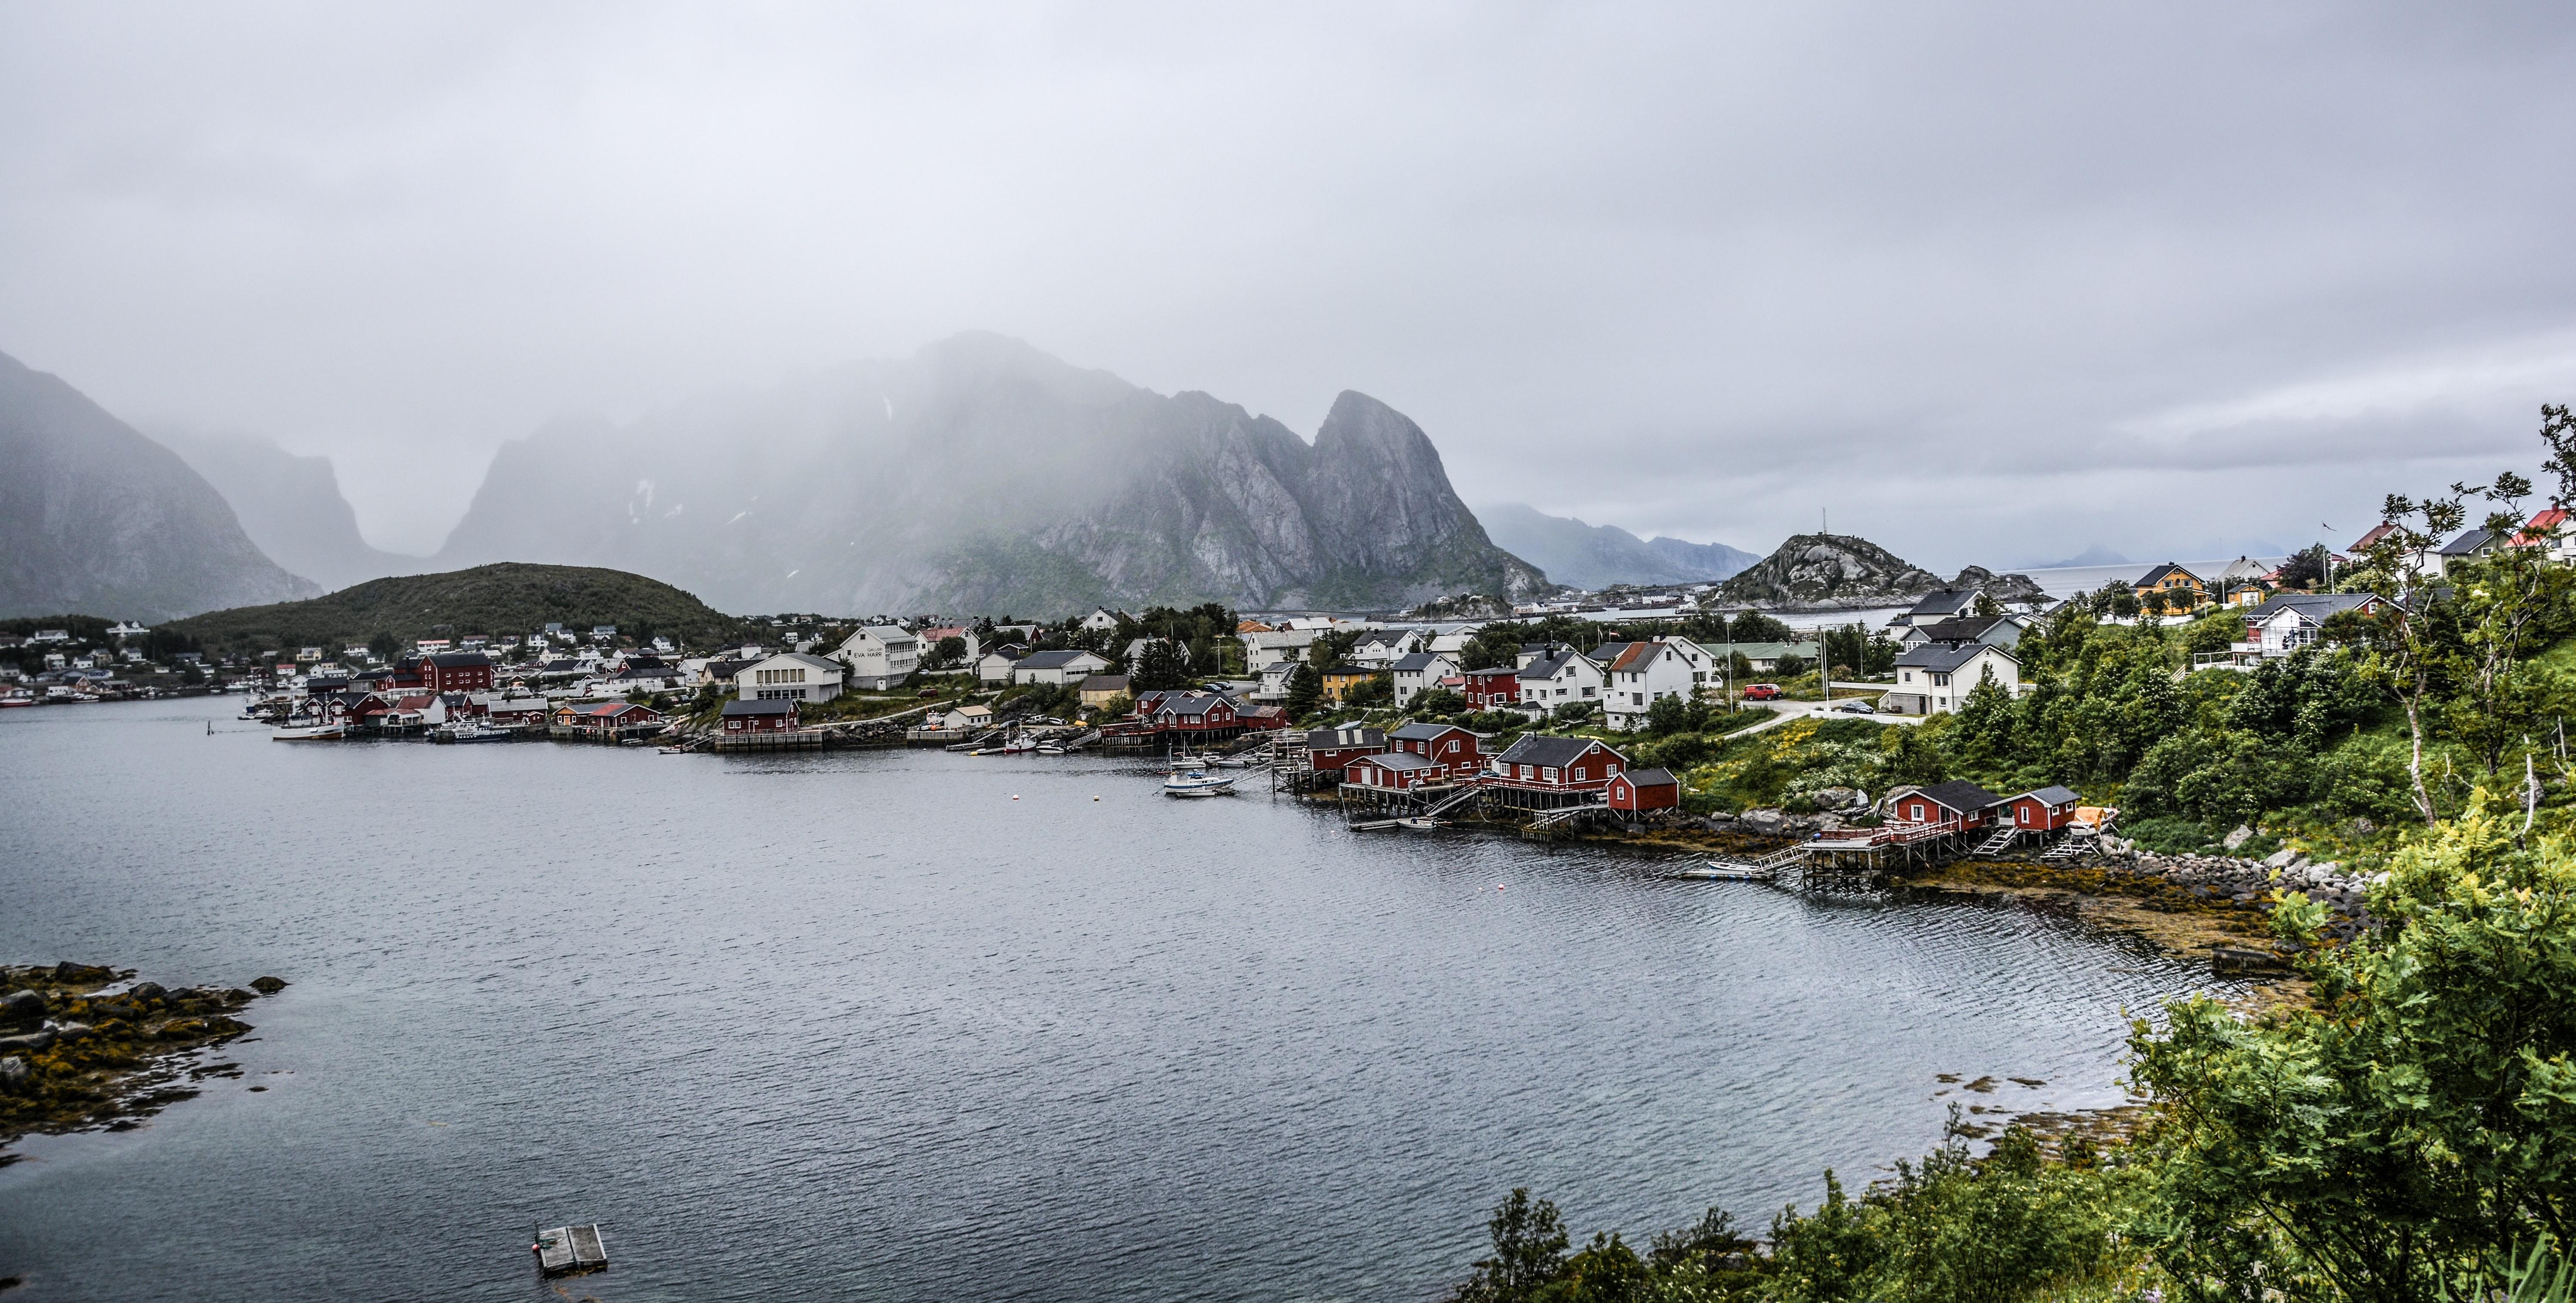 Rocky mountain near citizen houses near body of water photo